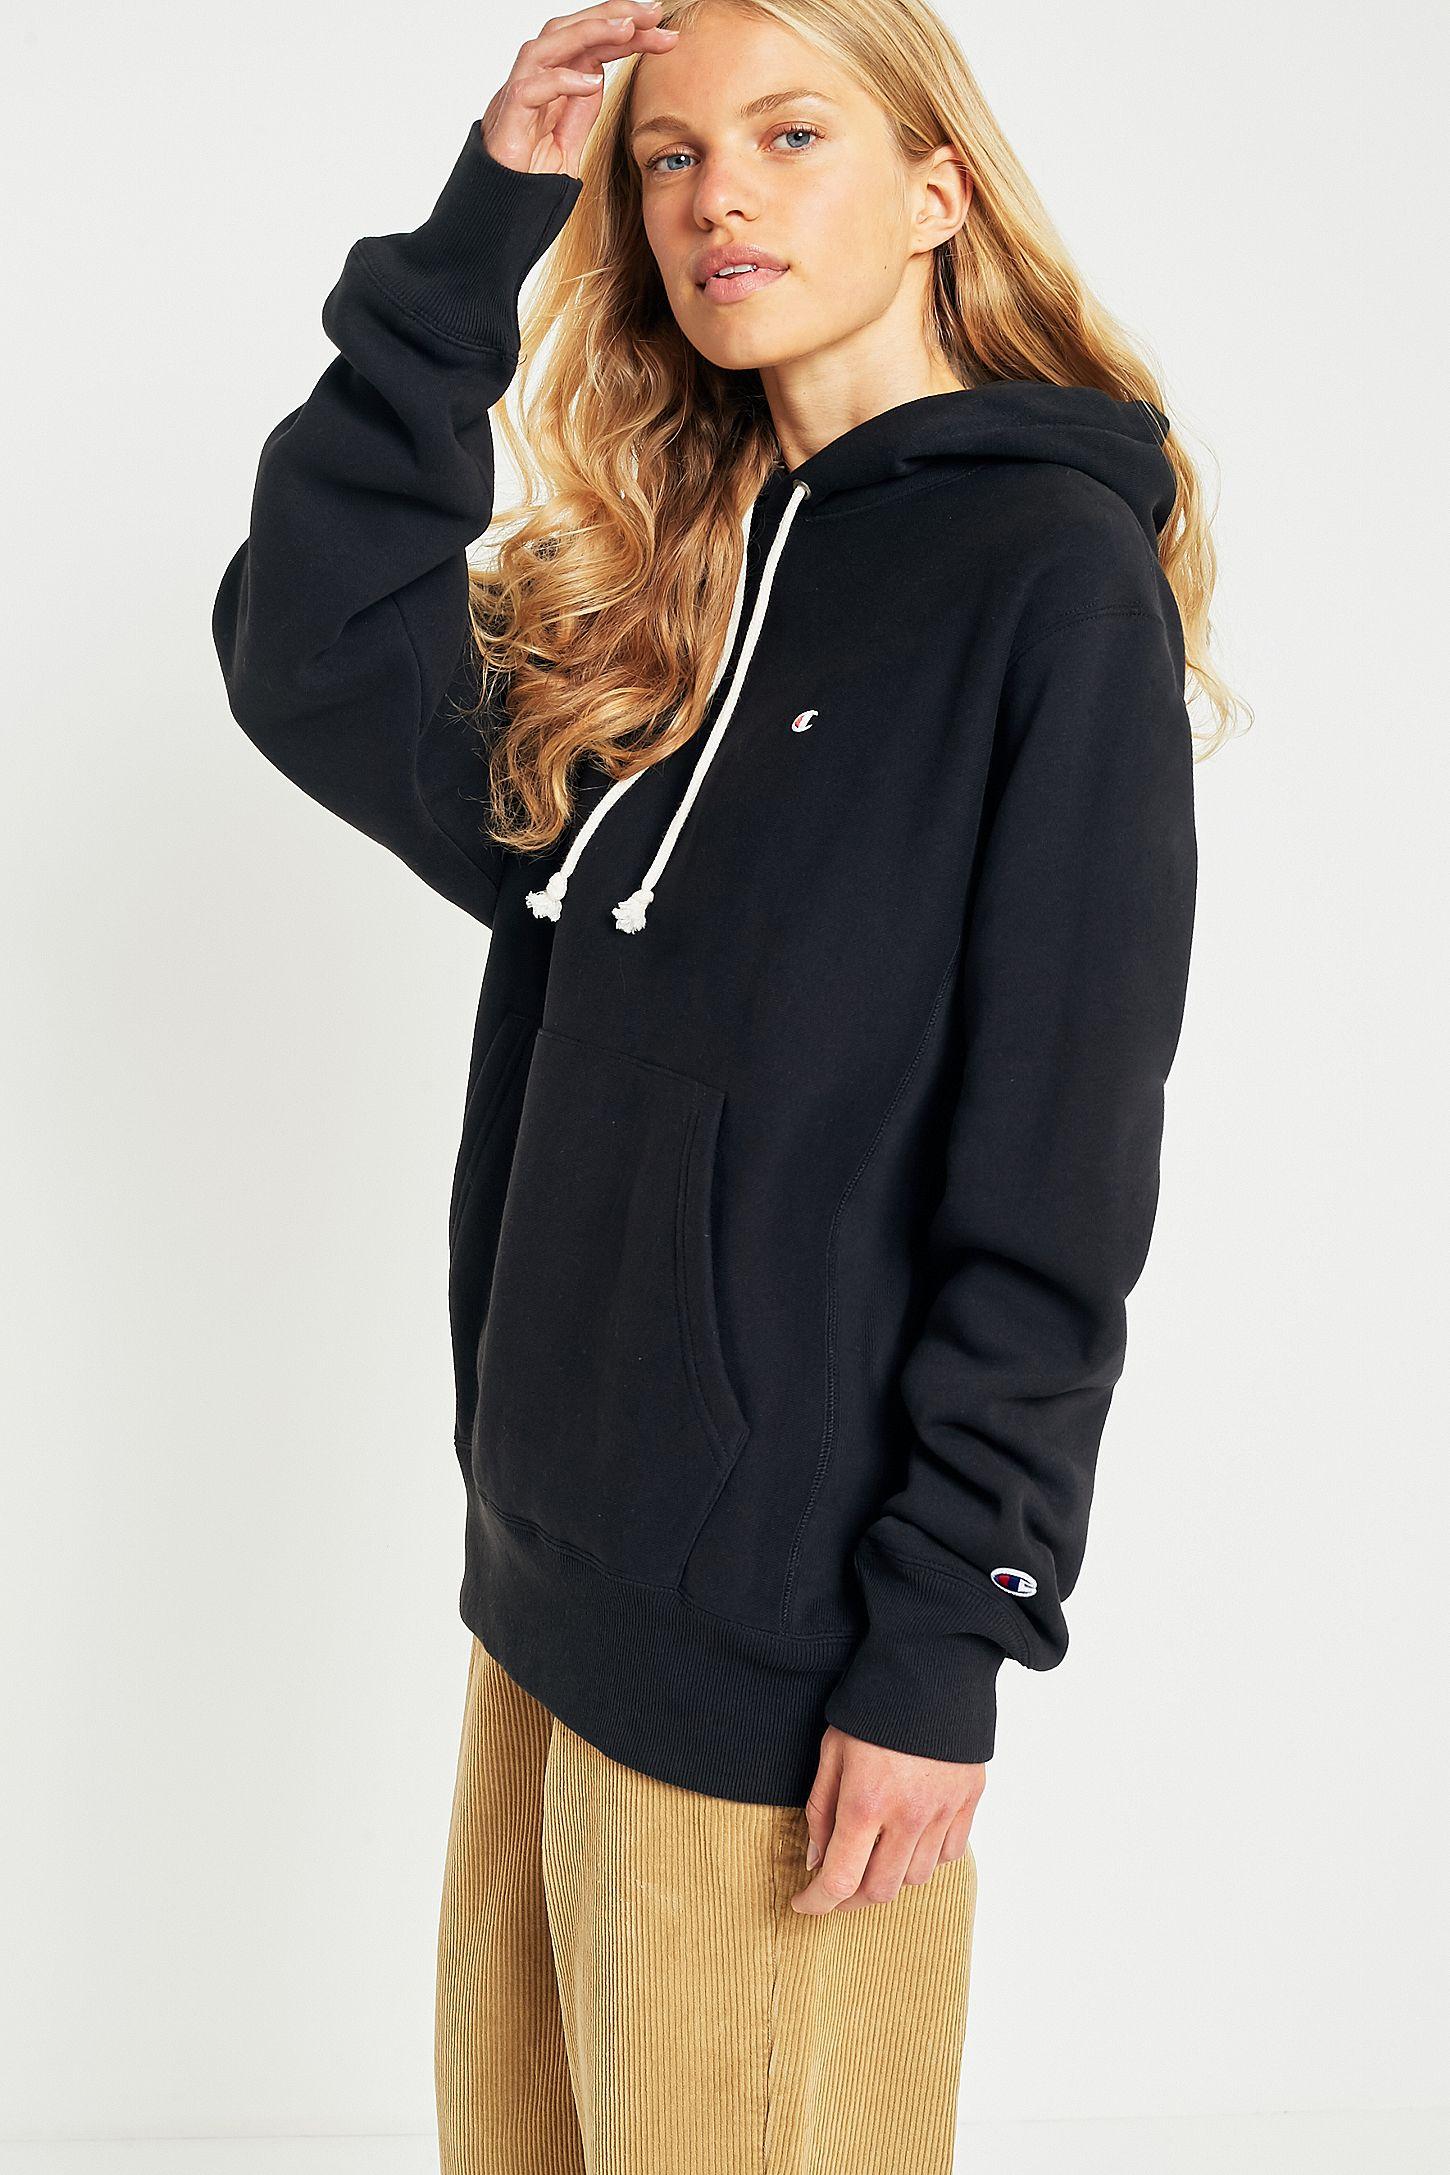 2daba64beadf Champion   UO Monochrome Reverse Weave Hoodie Sweatshirt